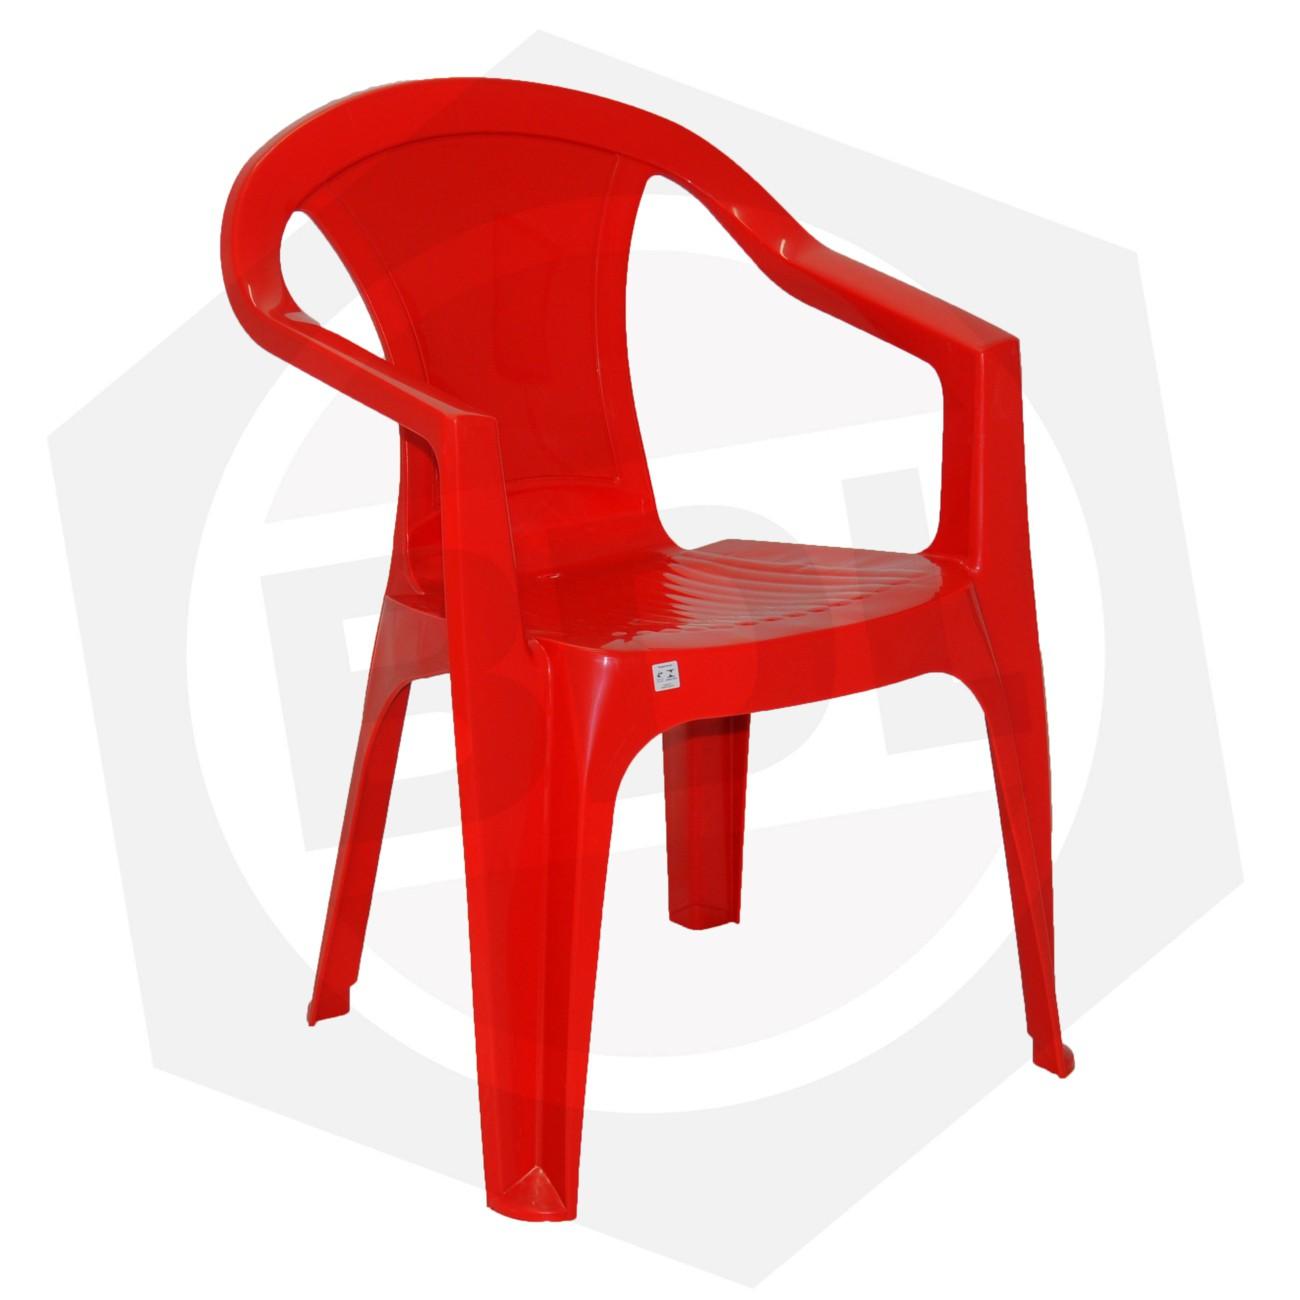 Silla Plástica ILHABELA Tramontina 92205/040 - ROJA